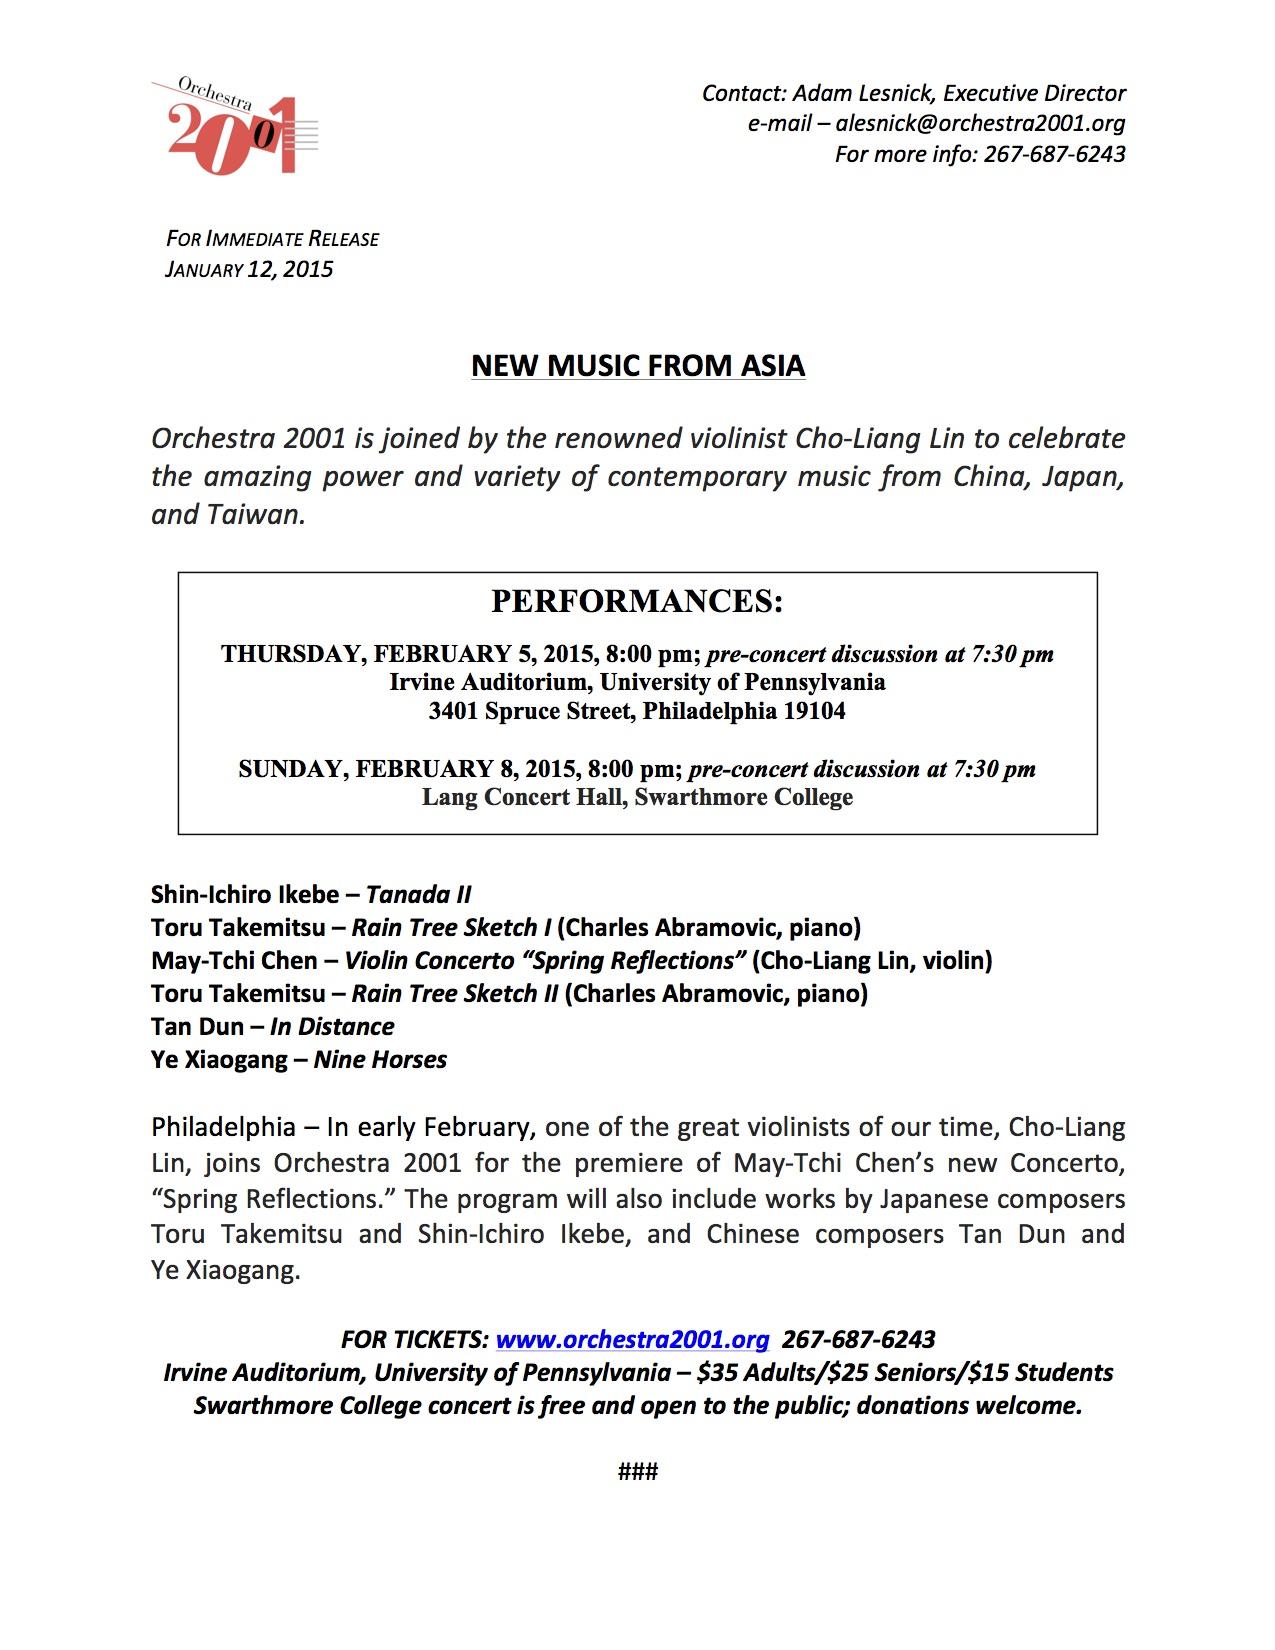 O2001_press_release_New_Asian